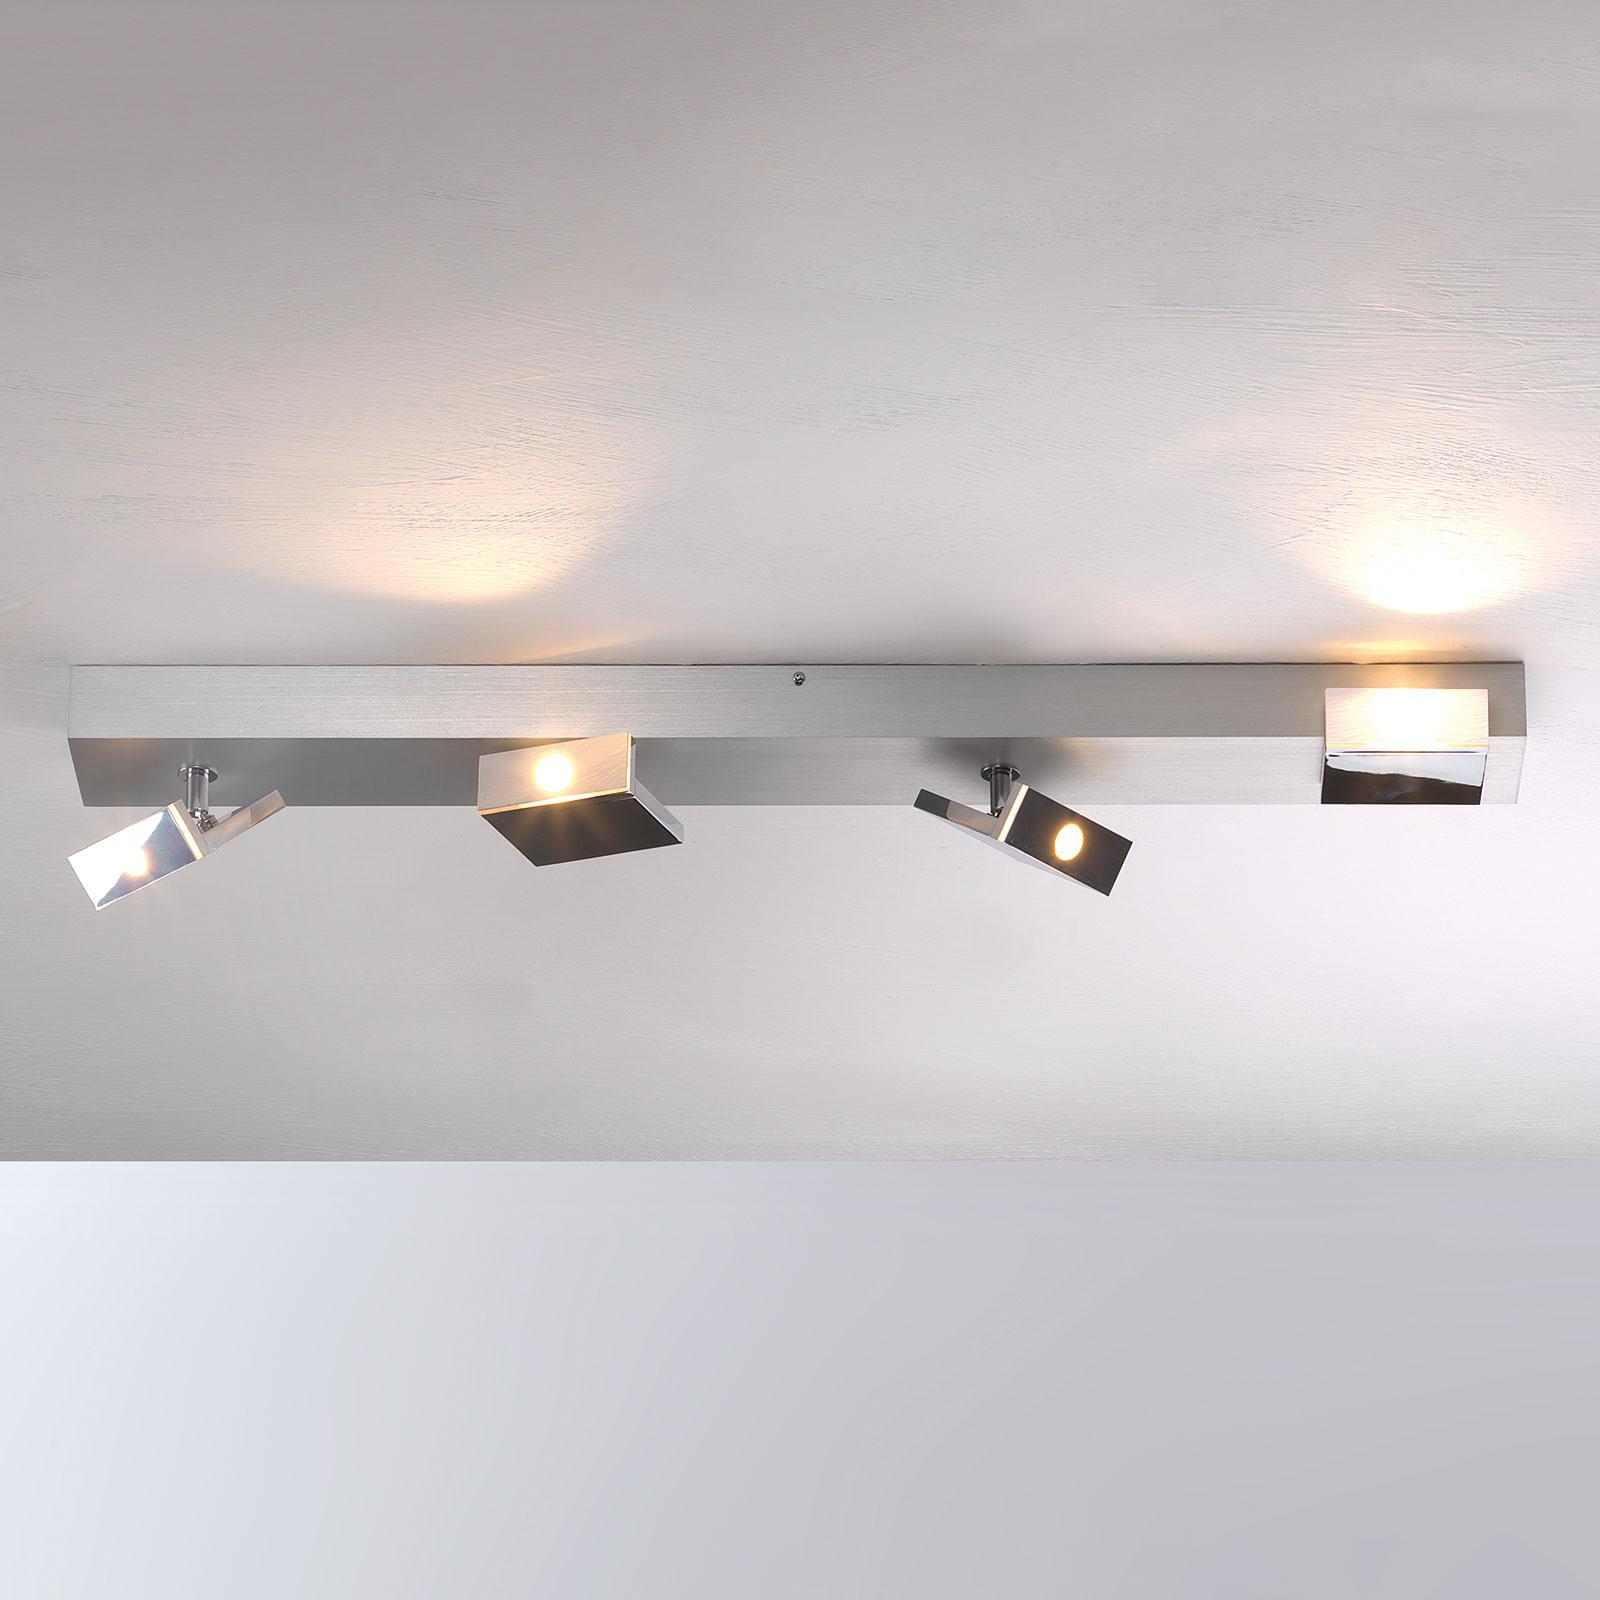 Elle - plafonnier spot LED, 4 lampes, variable